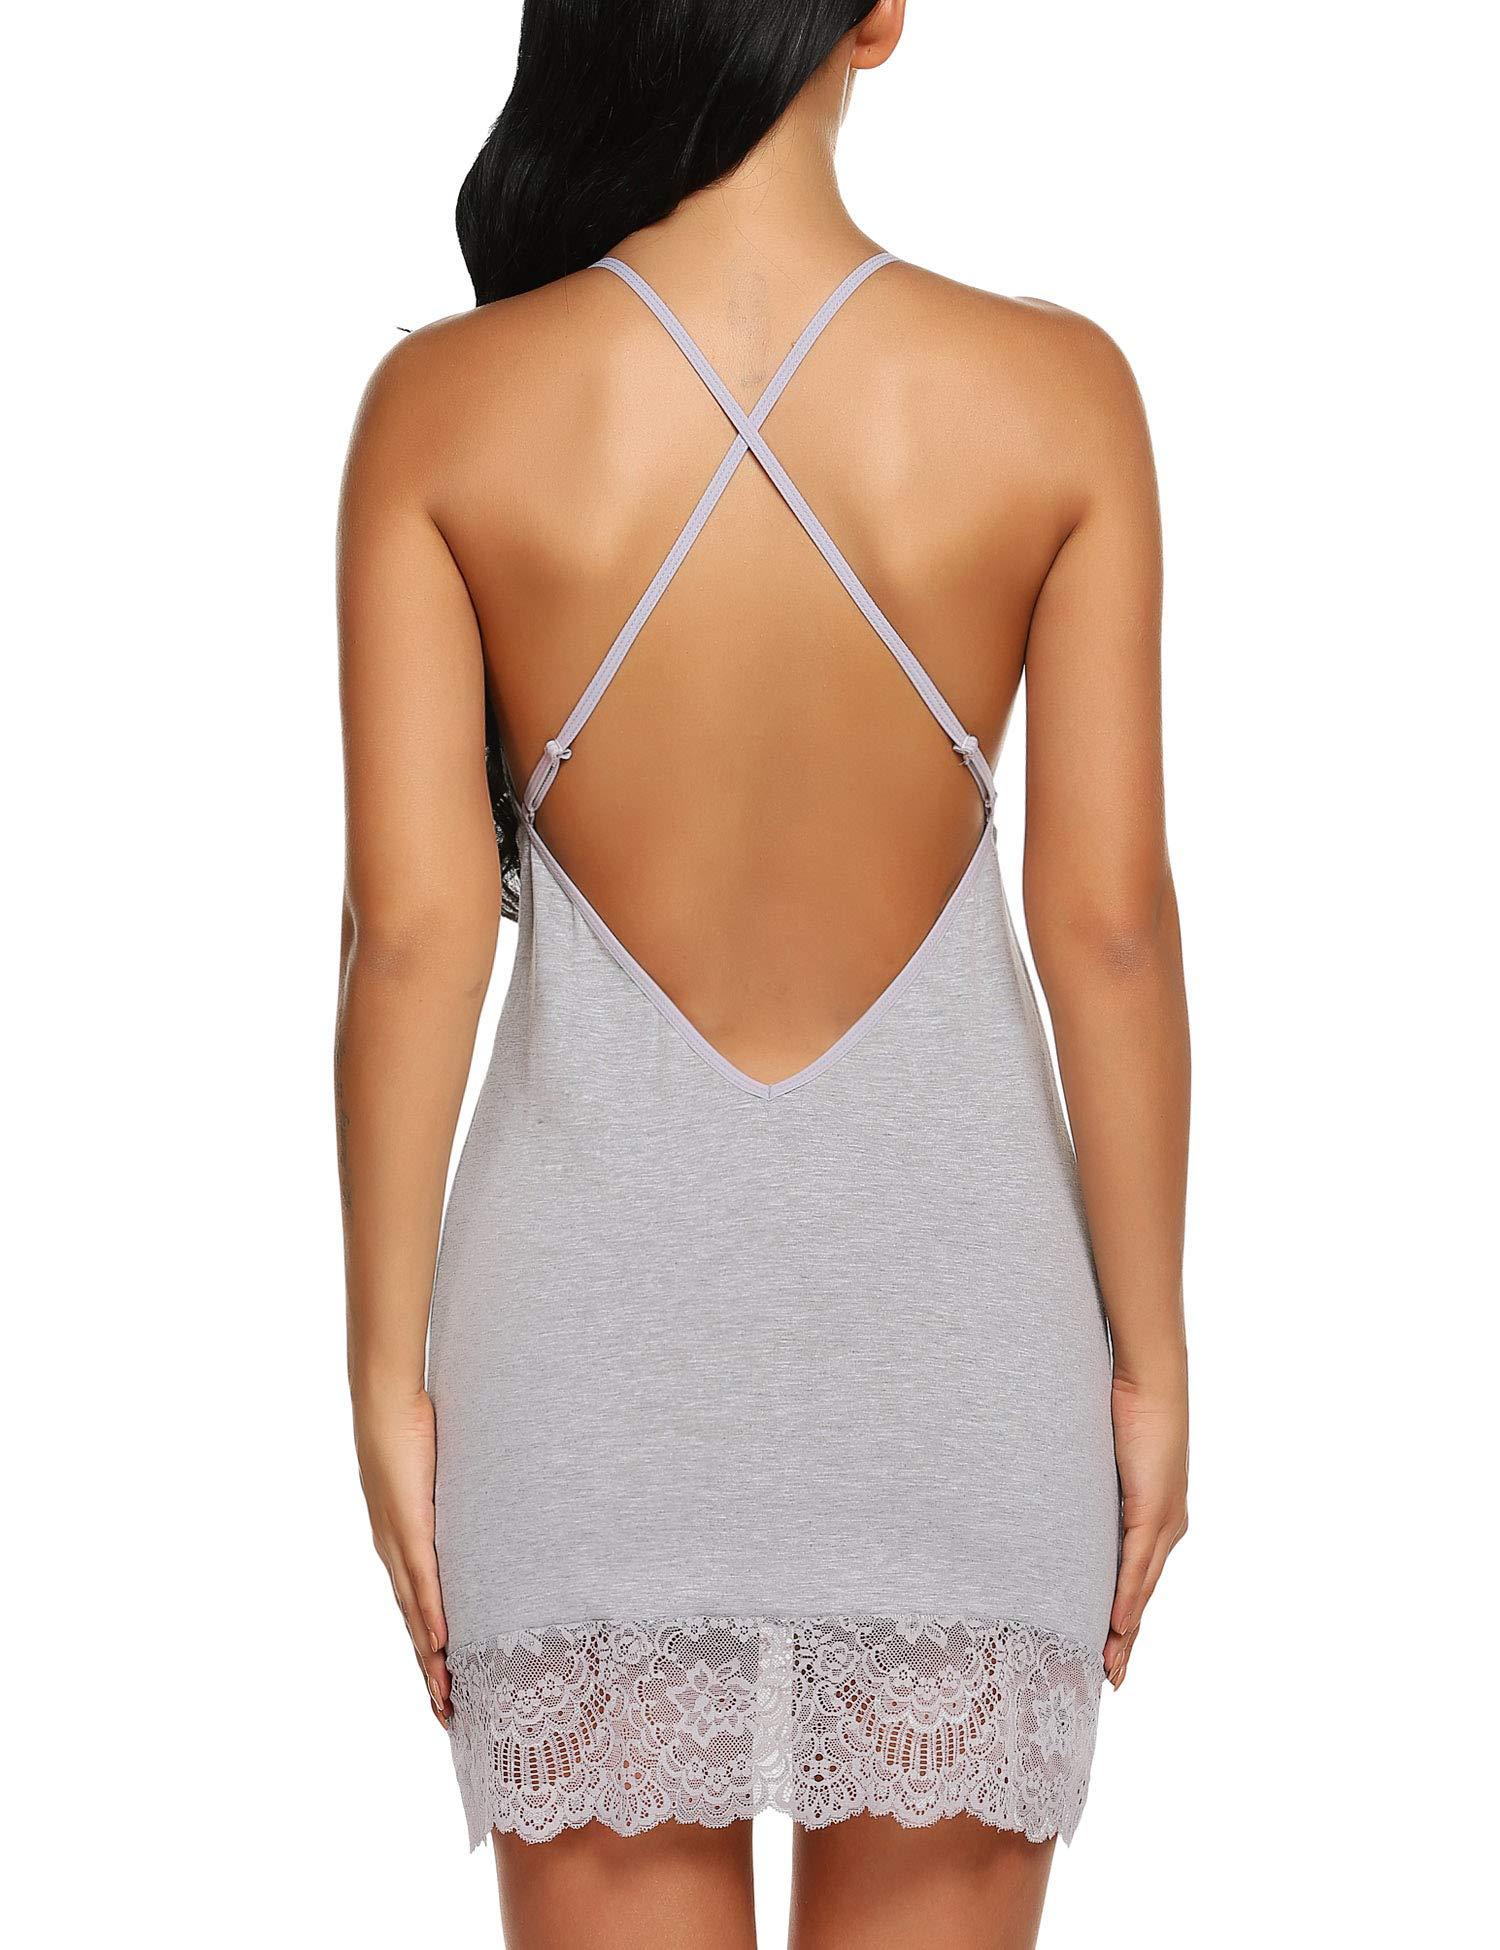 Klier Plus Size Sleepwear Cotton Nightshort Babydolls Lingerie Set